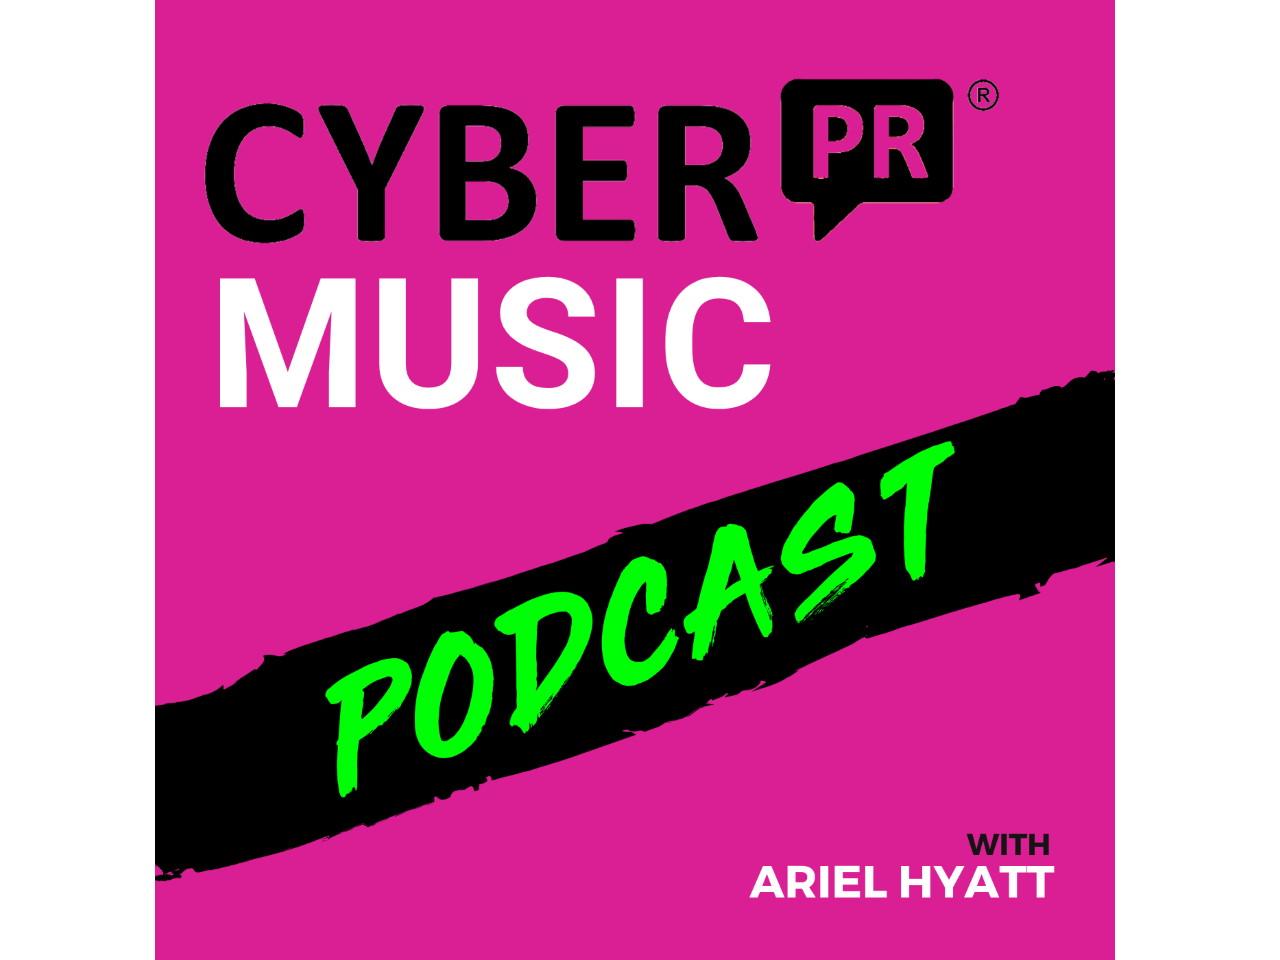 Cyber PR Podcast with Ariel Hyatt